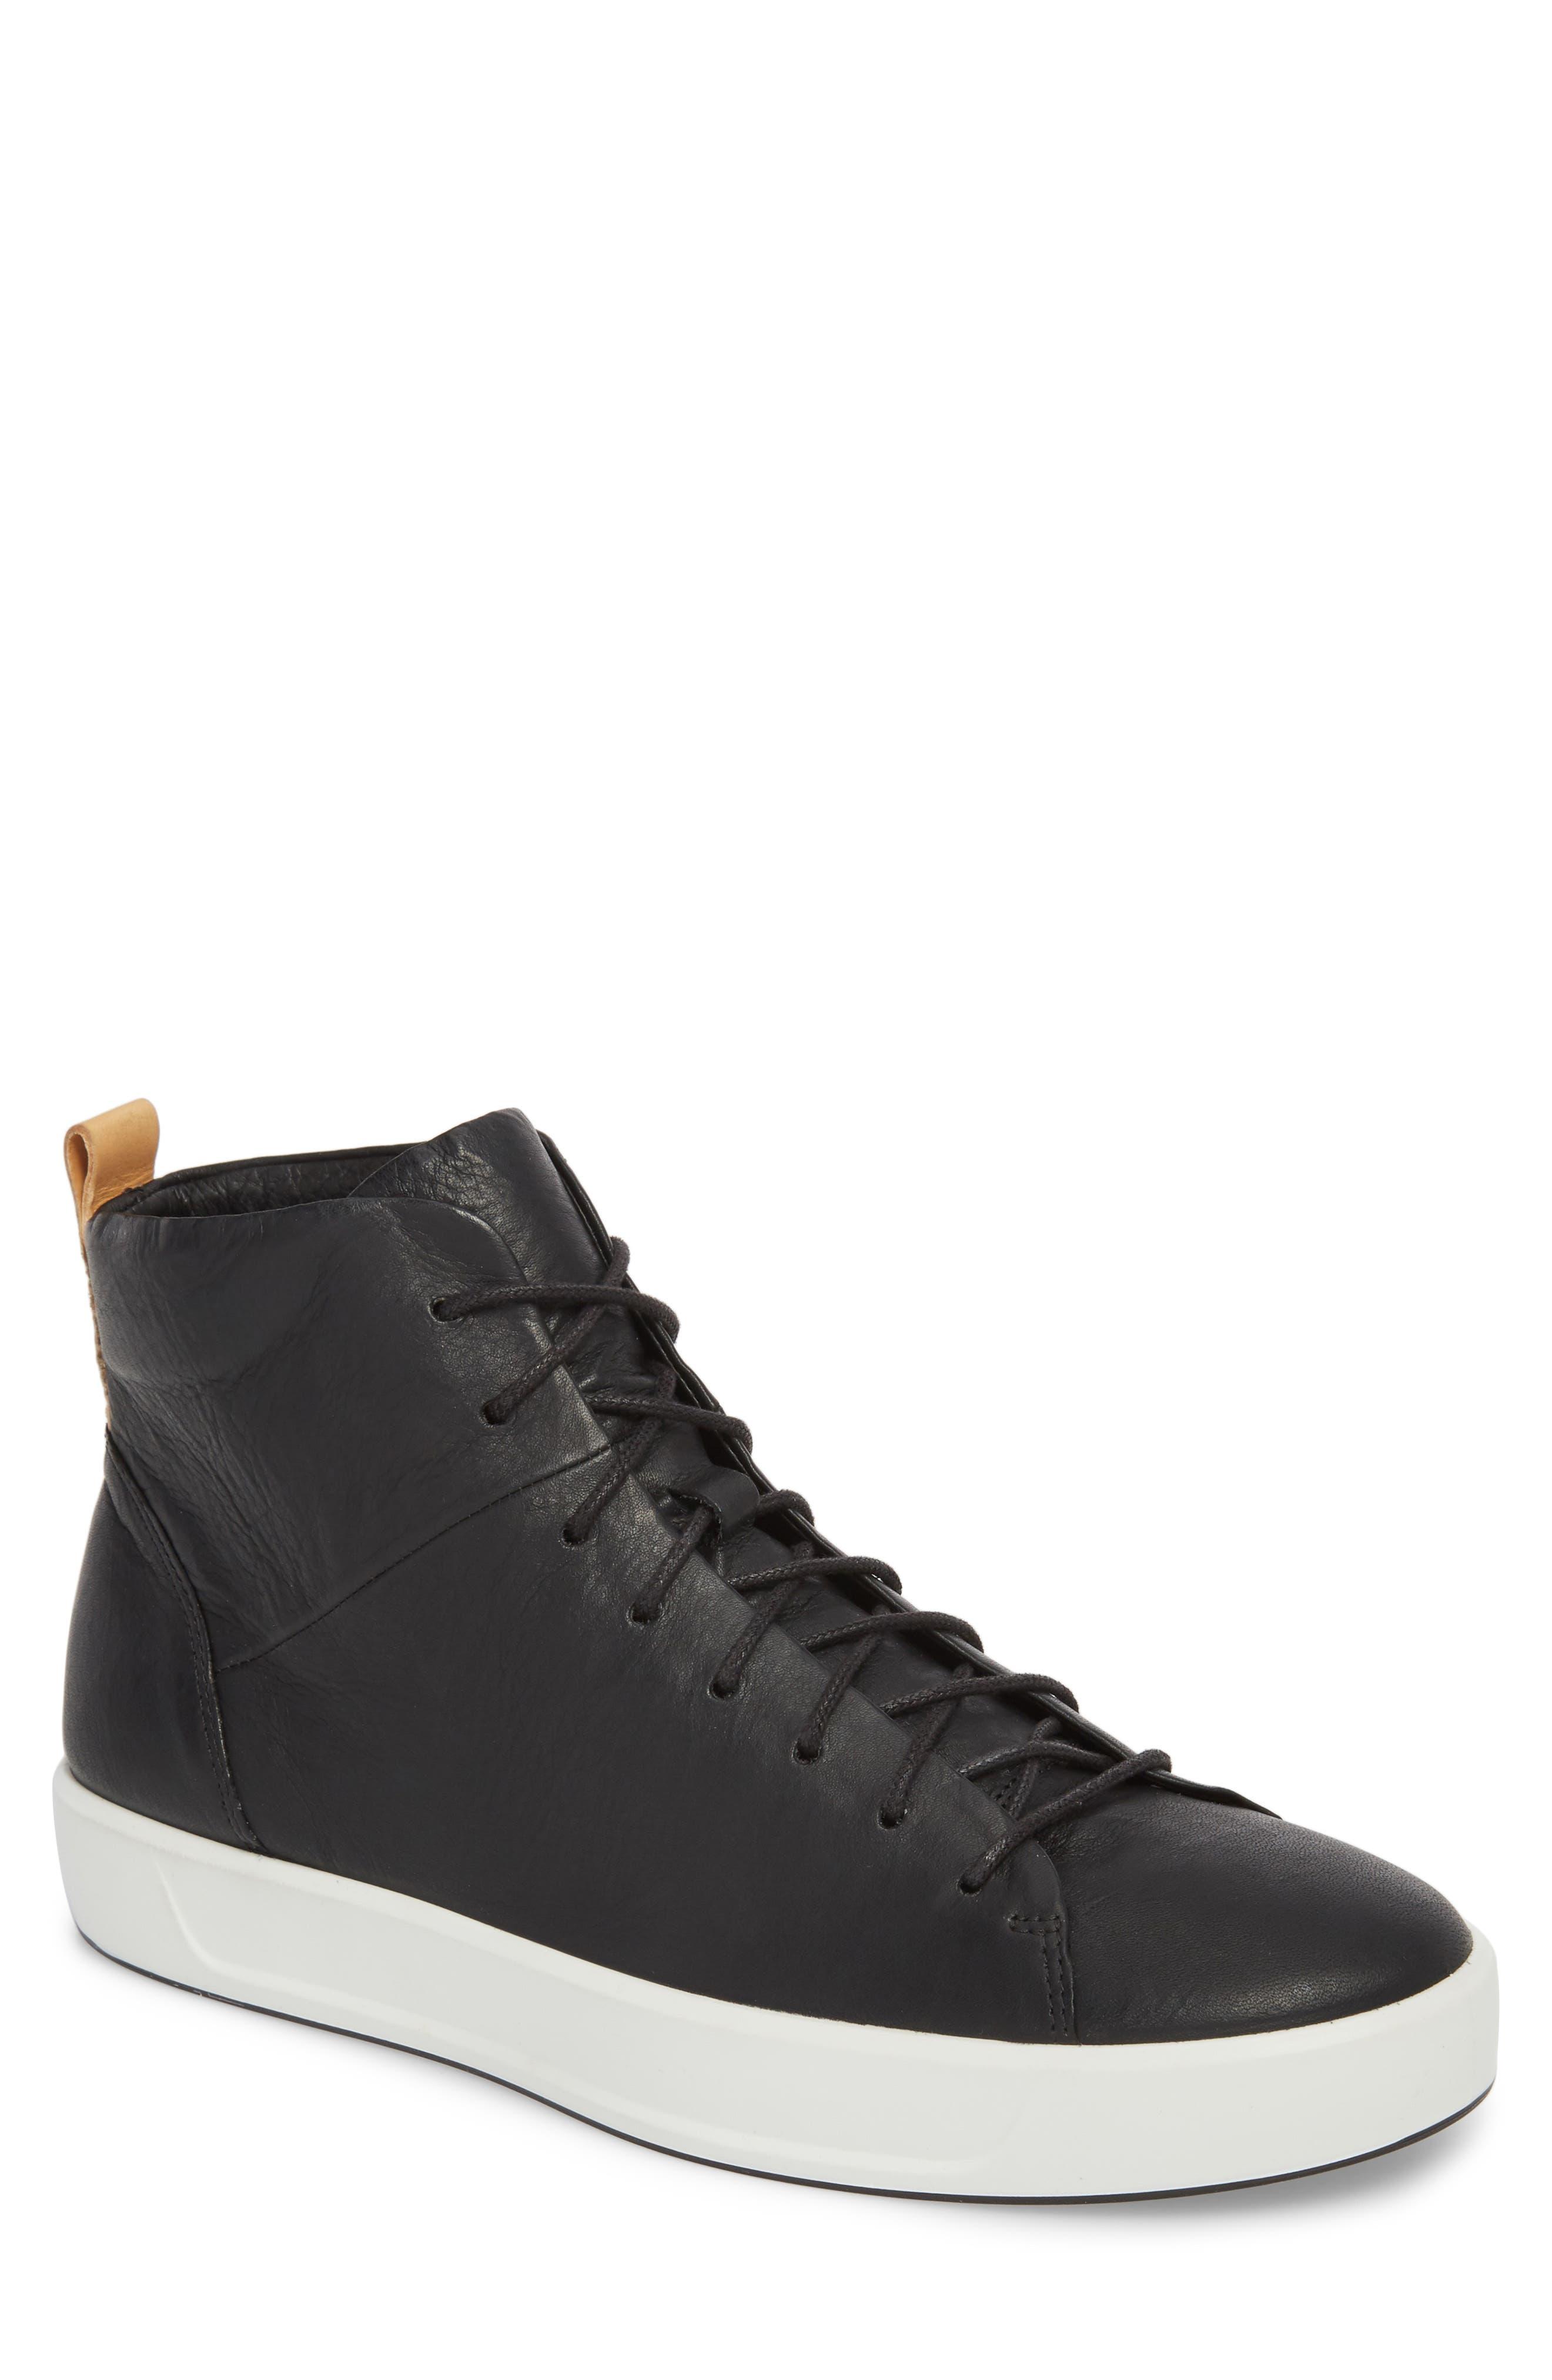 Soft 8 Sneaker,                         Main,                         color, Black/Black Leather